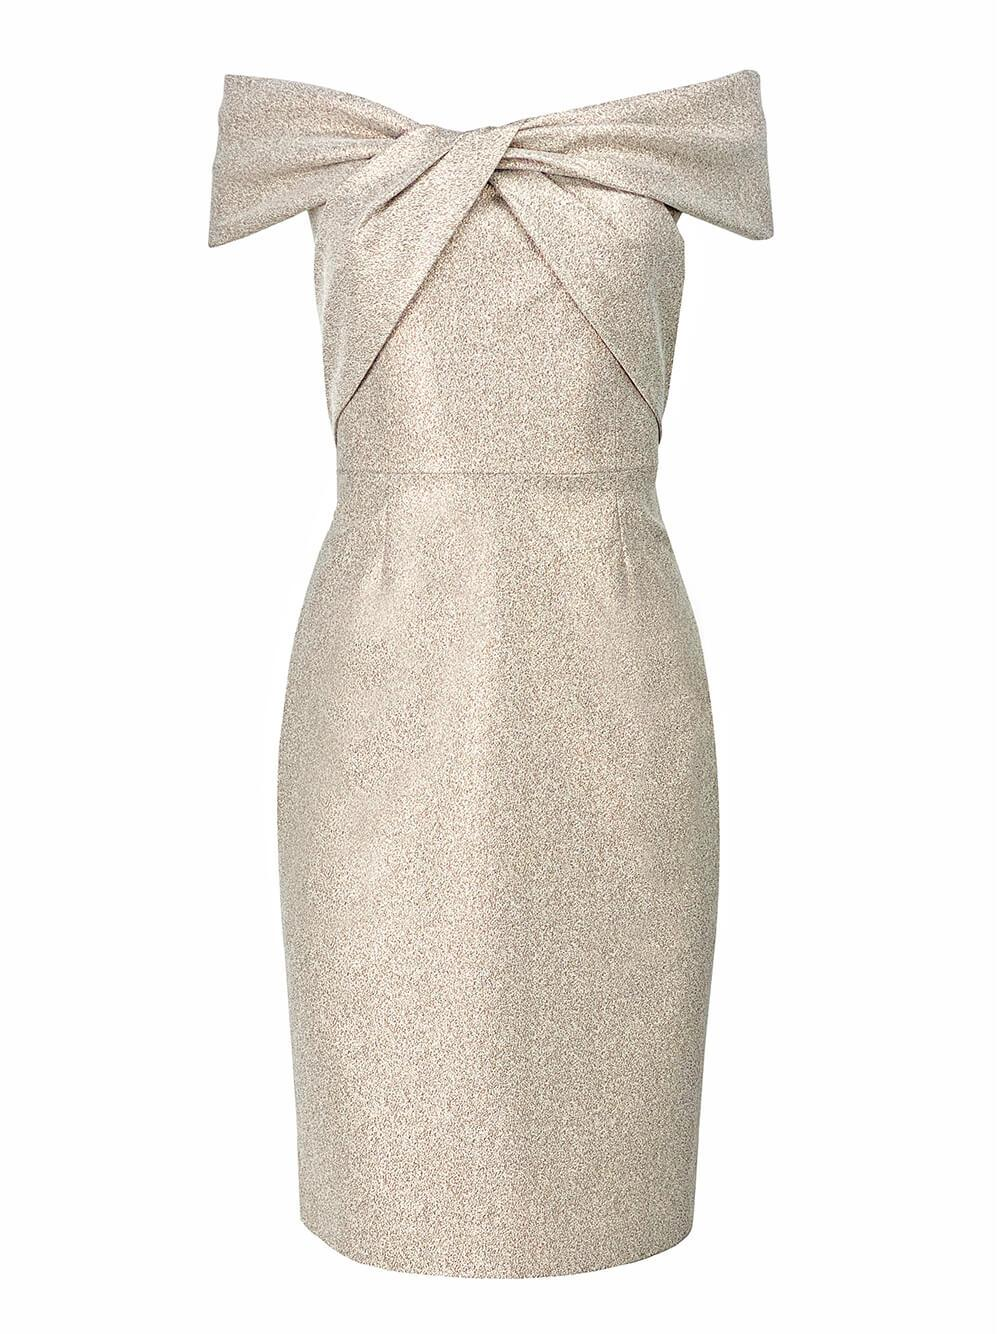 Off The Shoulder Midi Dress Item # 217217